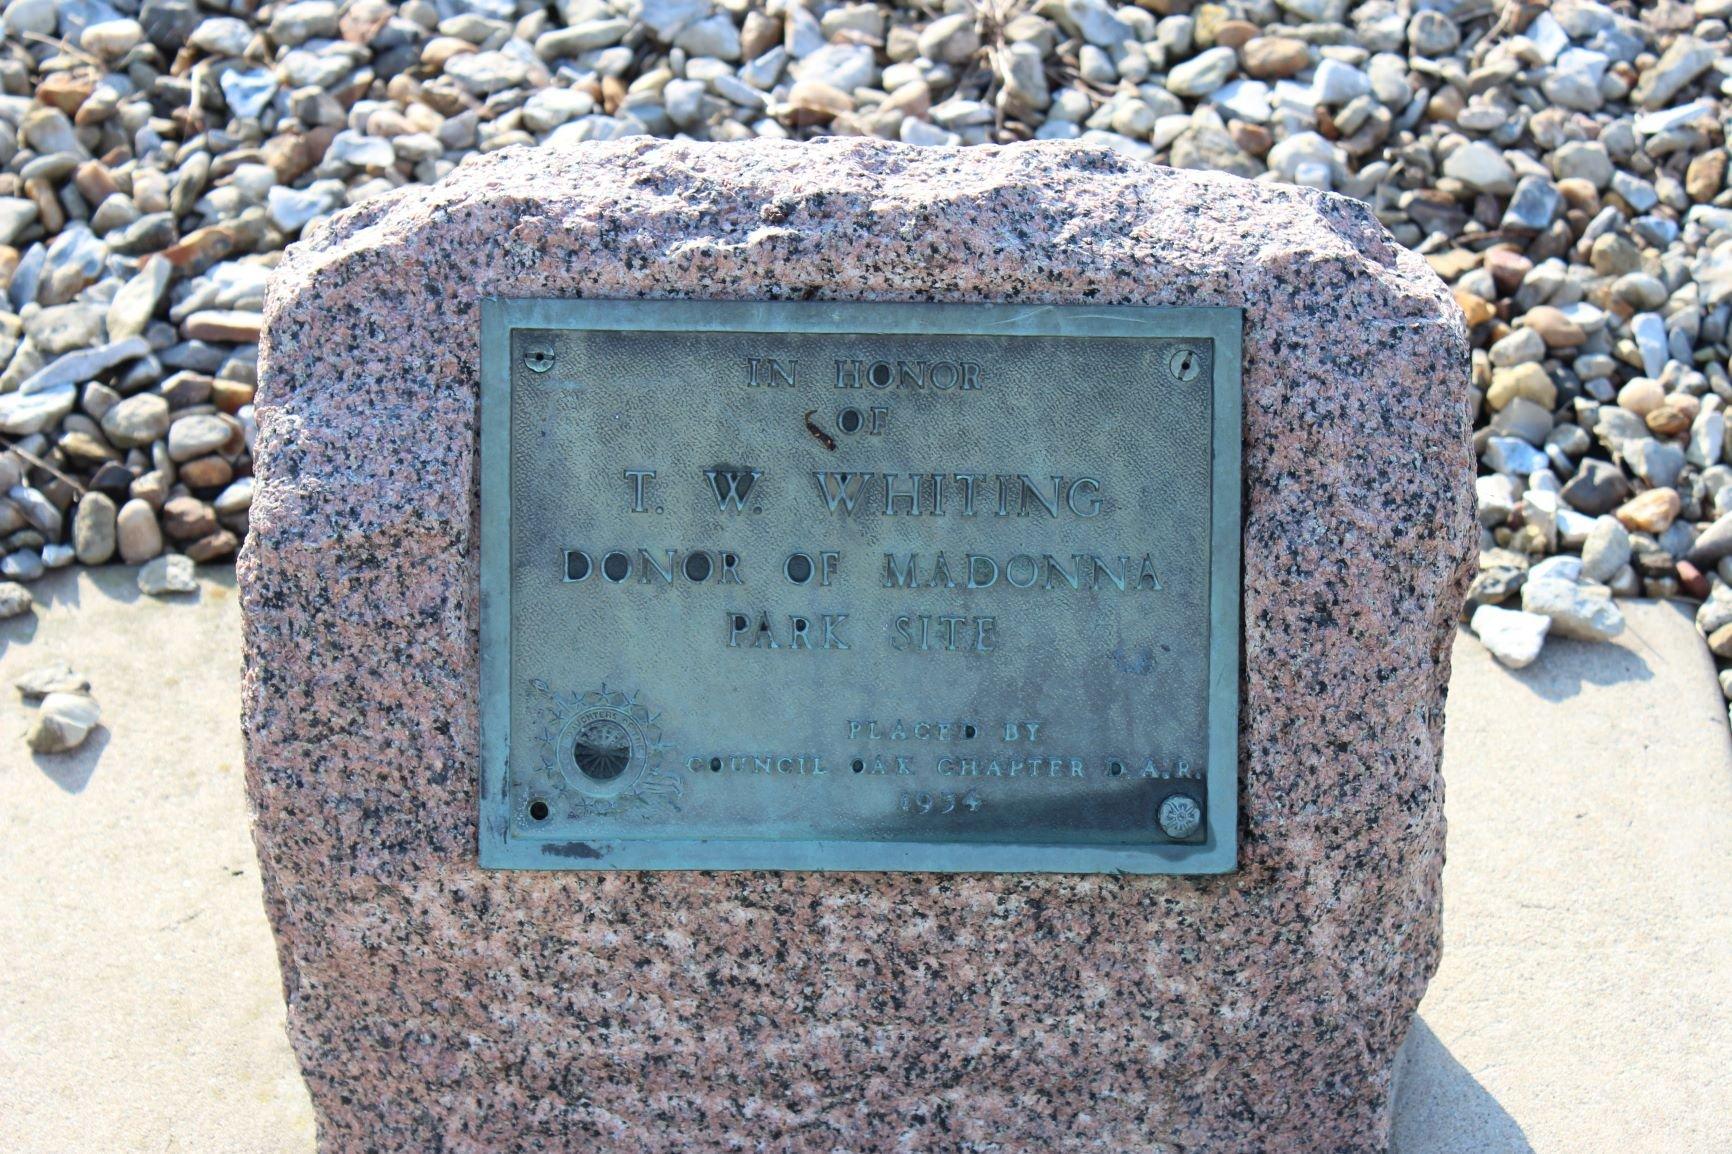 Madonna Park plaque. Photo by Cynthia Prescott.